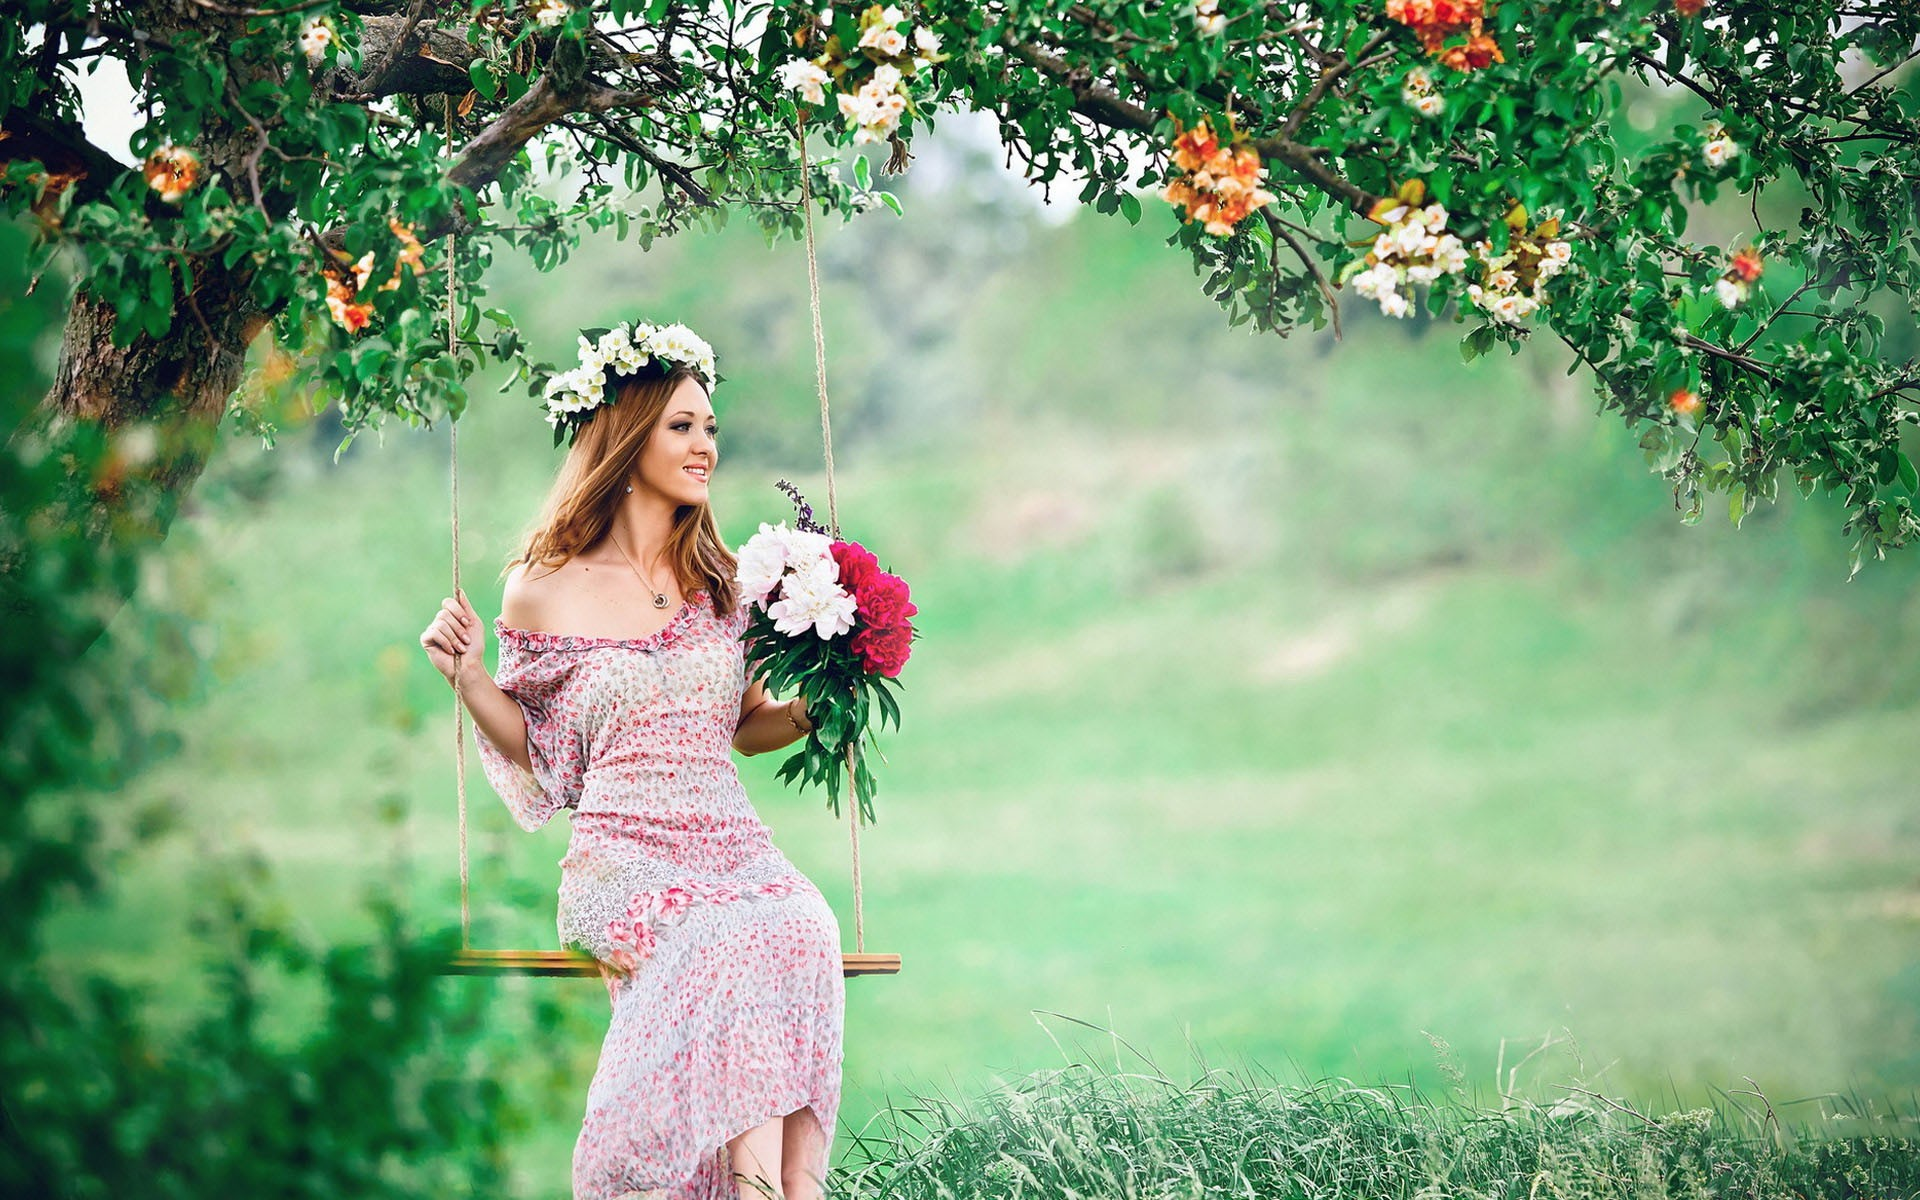 Download-Girl-With-Flower-Bucket-Wallpaper